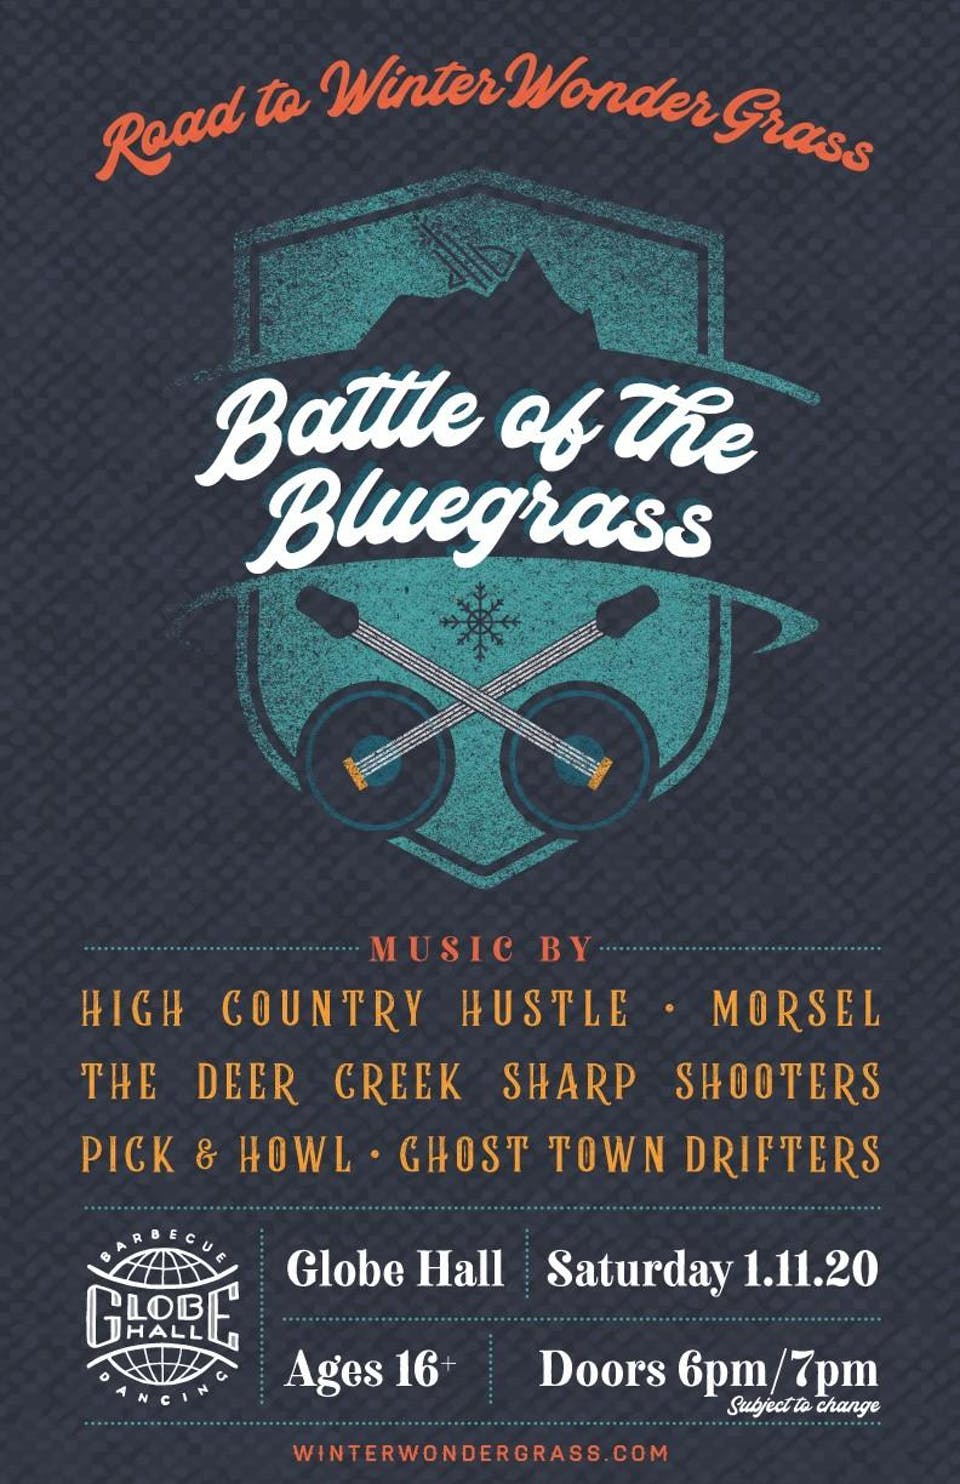 Road to Winter WonderGrass – Battle of the Bluegrass